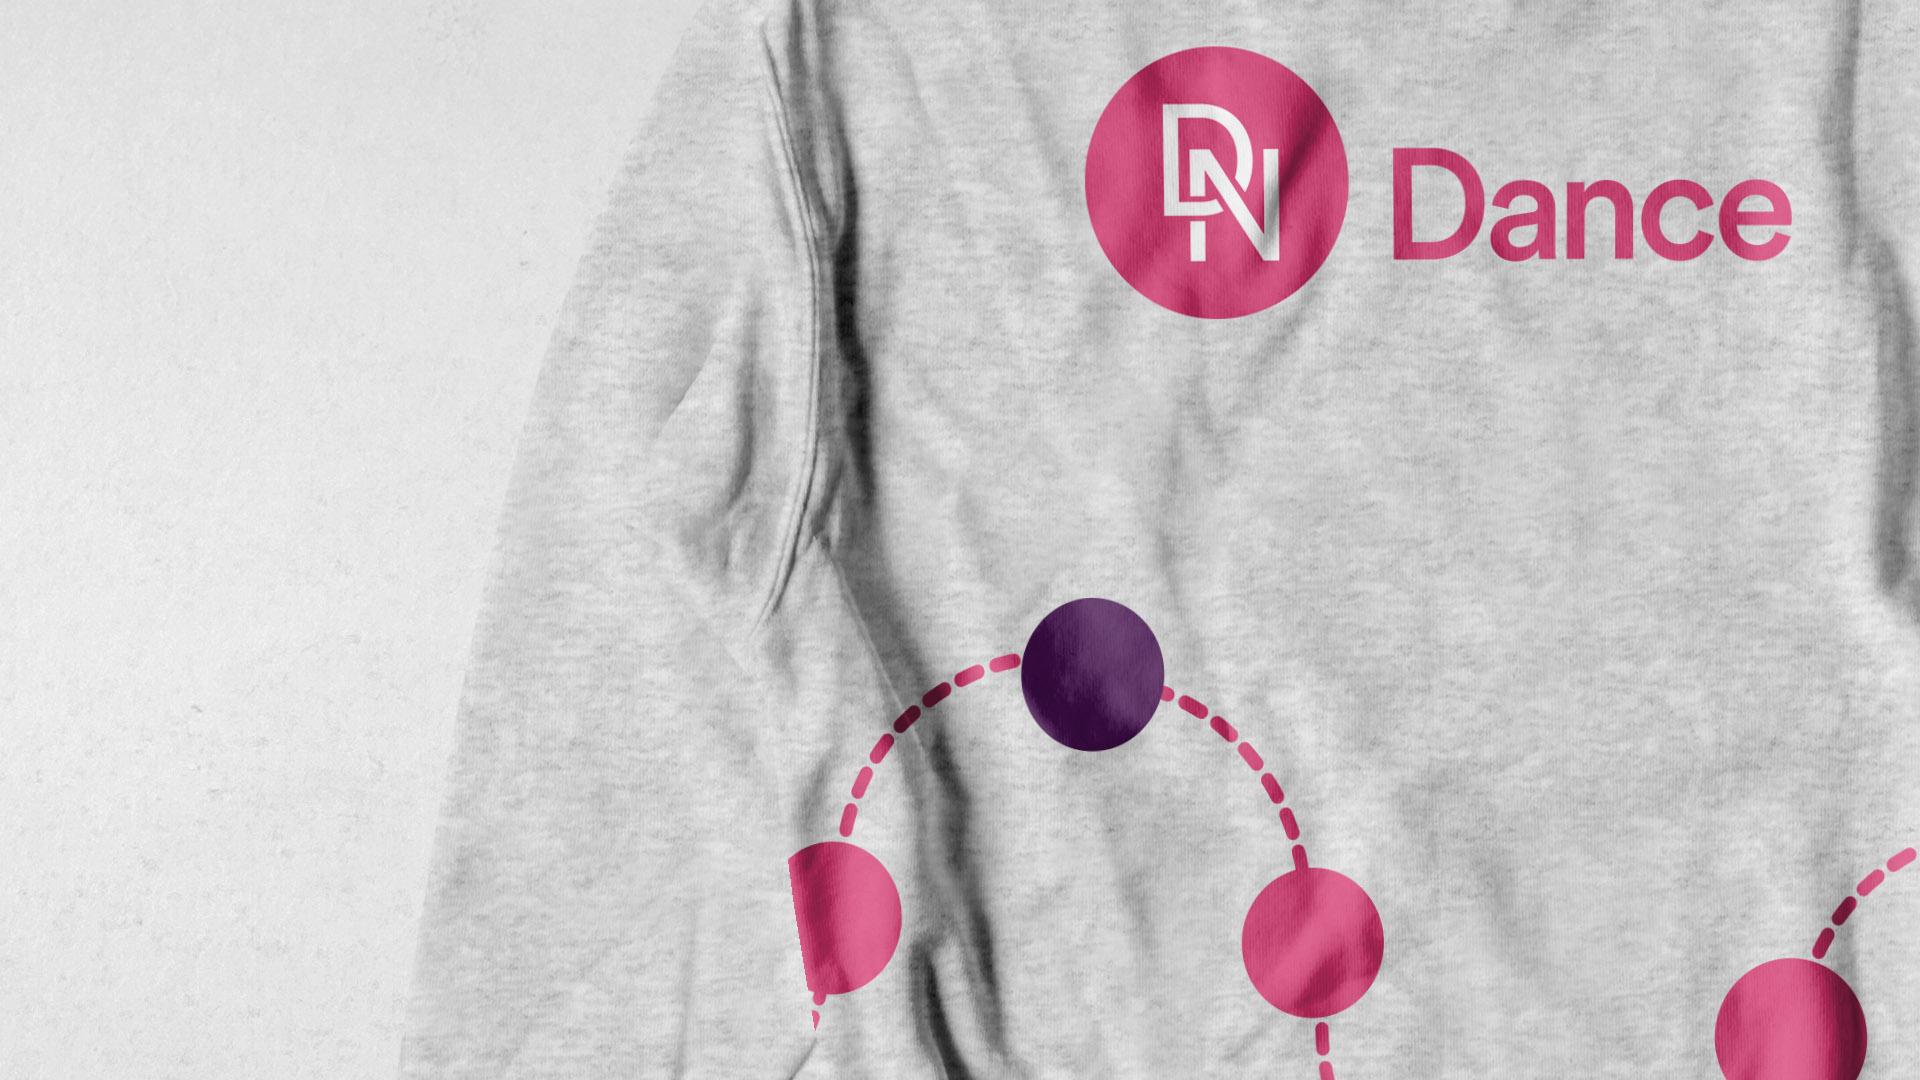 DN Dance tshirt branding